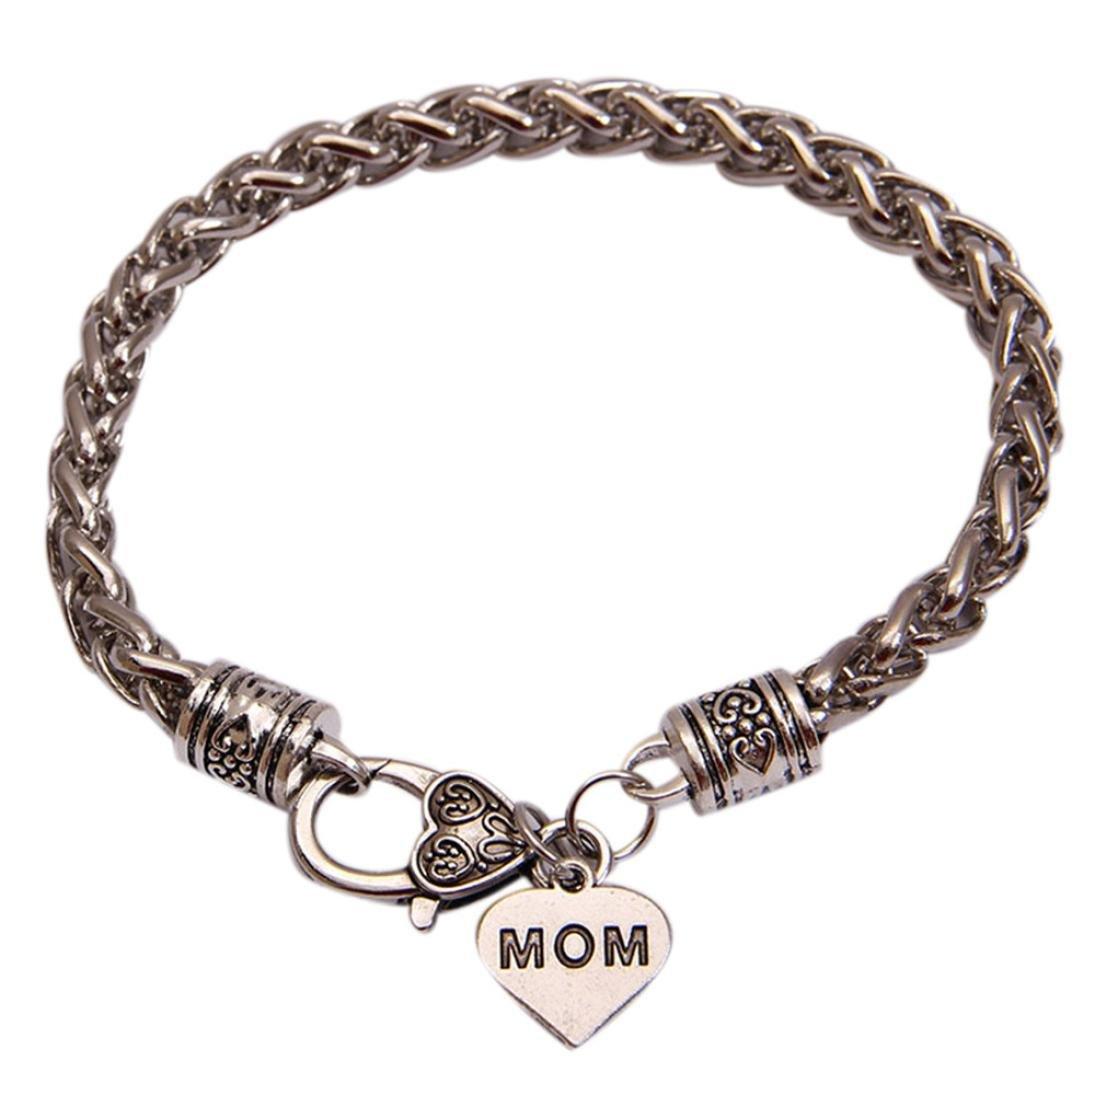 BCDshop Fashion Unisex's Chain Bracelet Jewelry Stainless Steel Cuban Curb Link Wristband Bracelets (A, alloy)